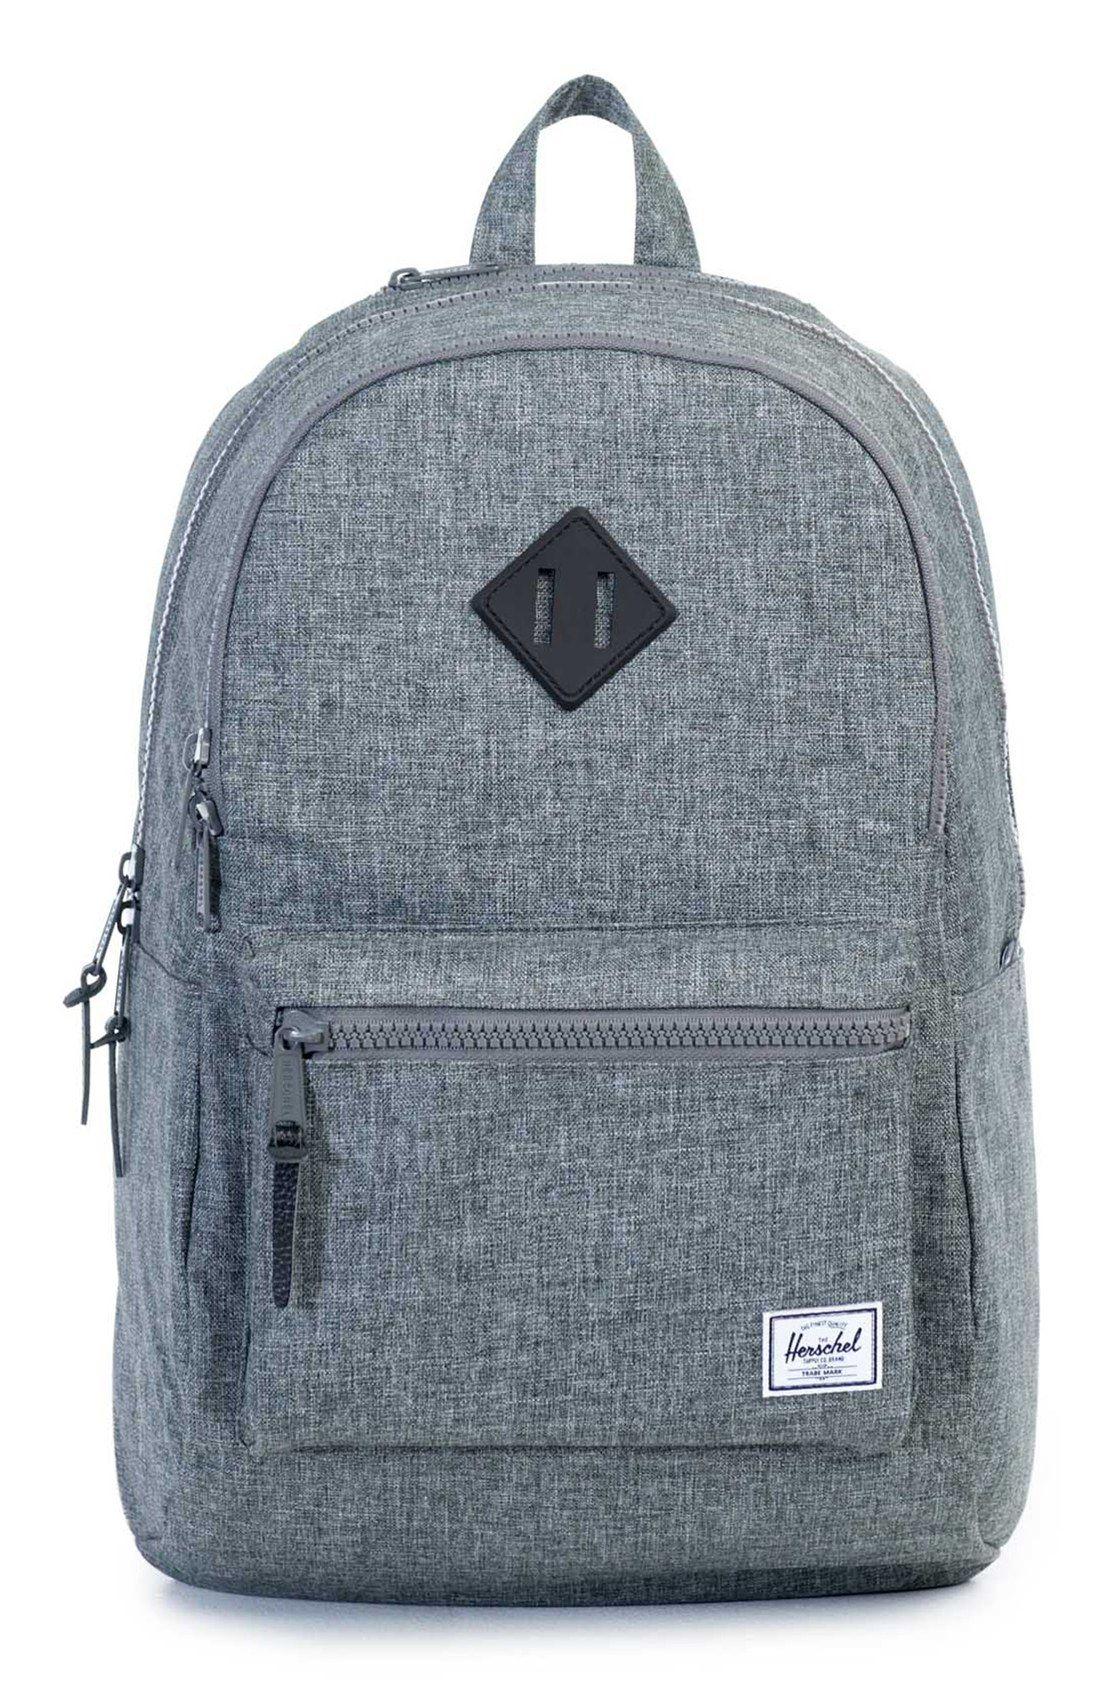 fb9bba55100 Herschel Supply Co.  Lennox  Backpack